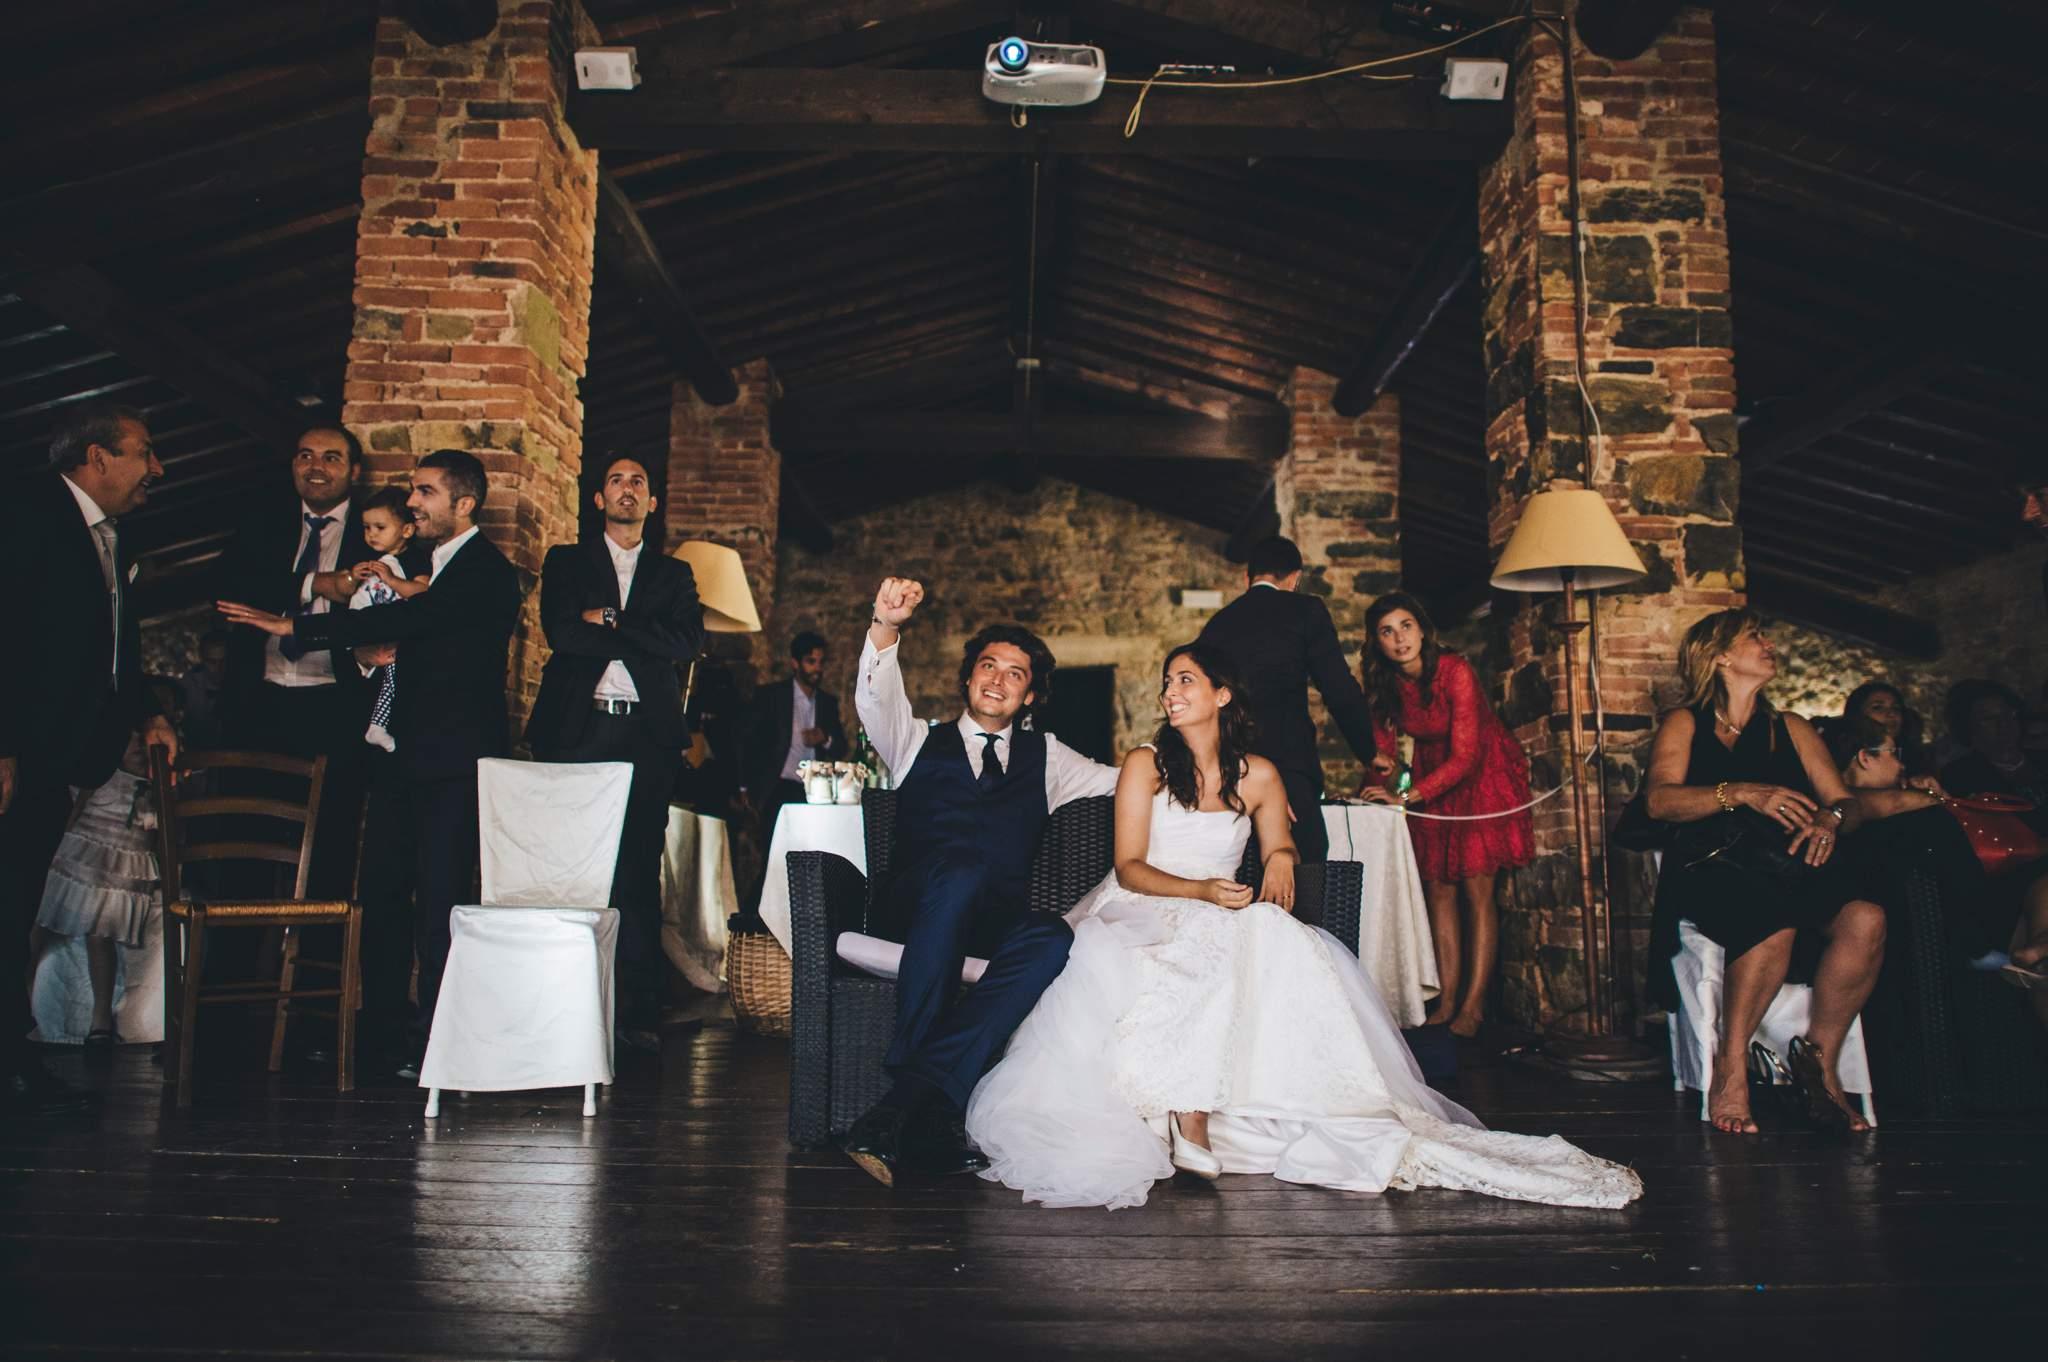 Band Matrimonio Toscana : Fotografo matrimonio toscana fattoria di montelucci